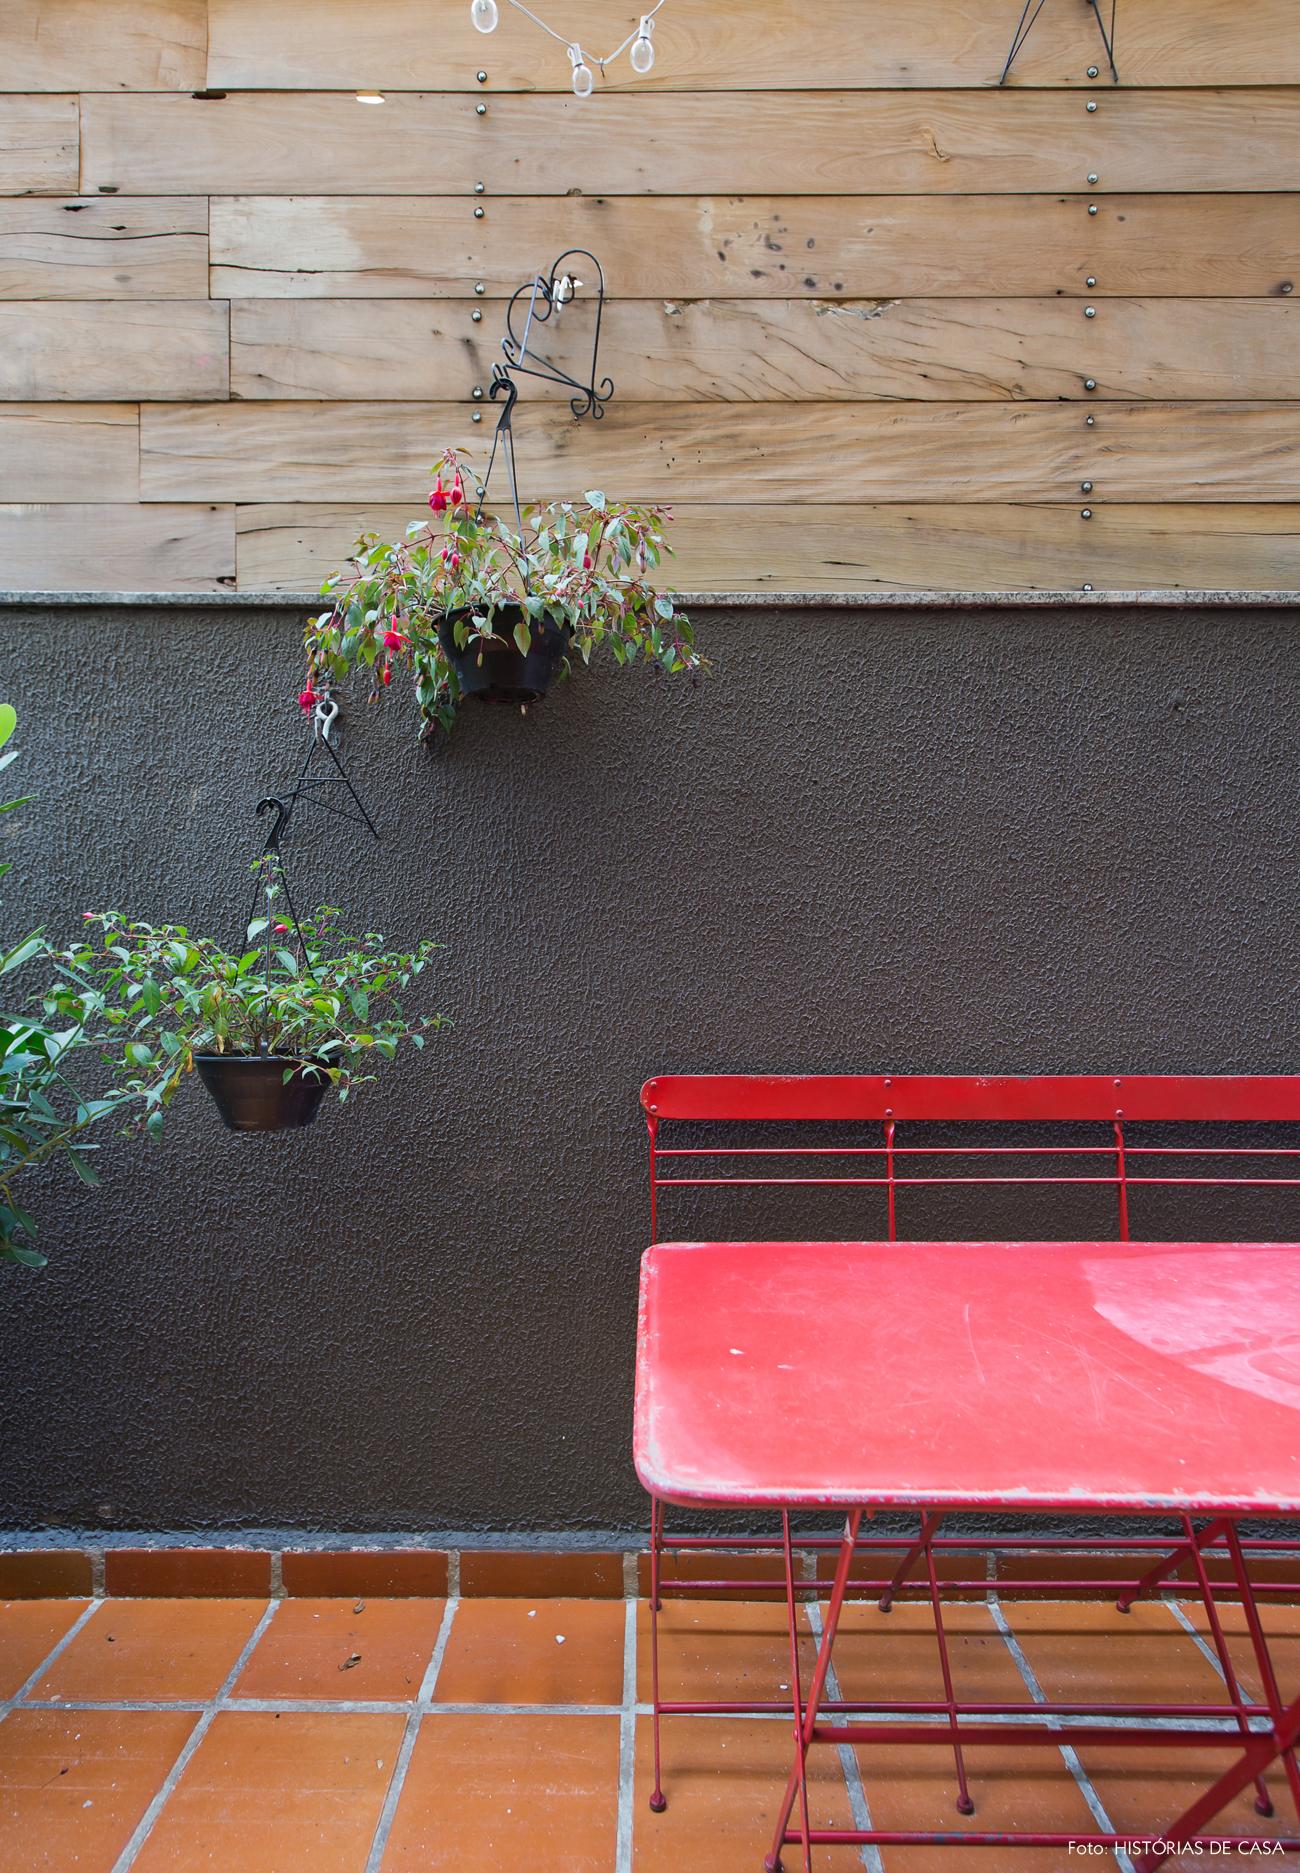 16-decoracao-terraco-varanda-de-apartamento-parede-madeira